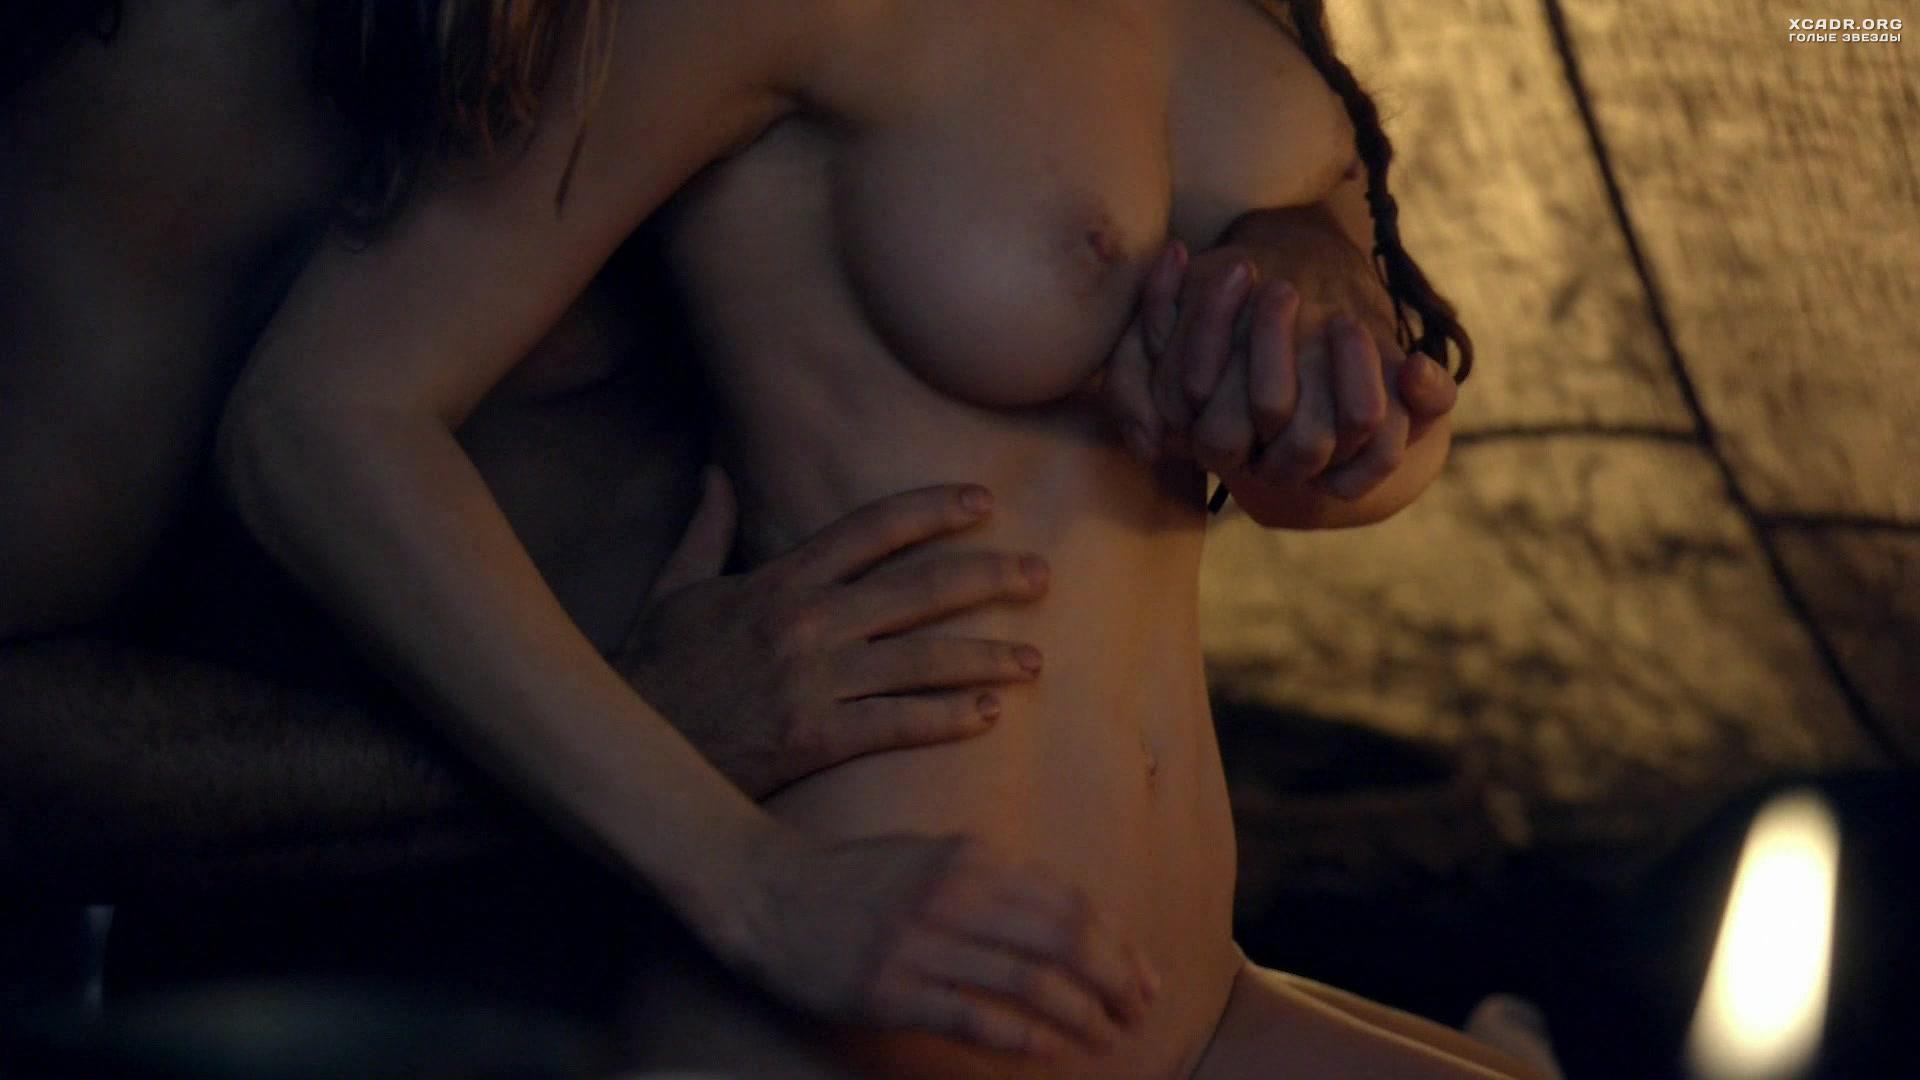 Gwendoline xxx erotic tube